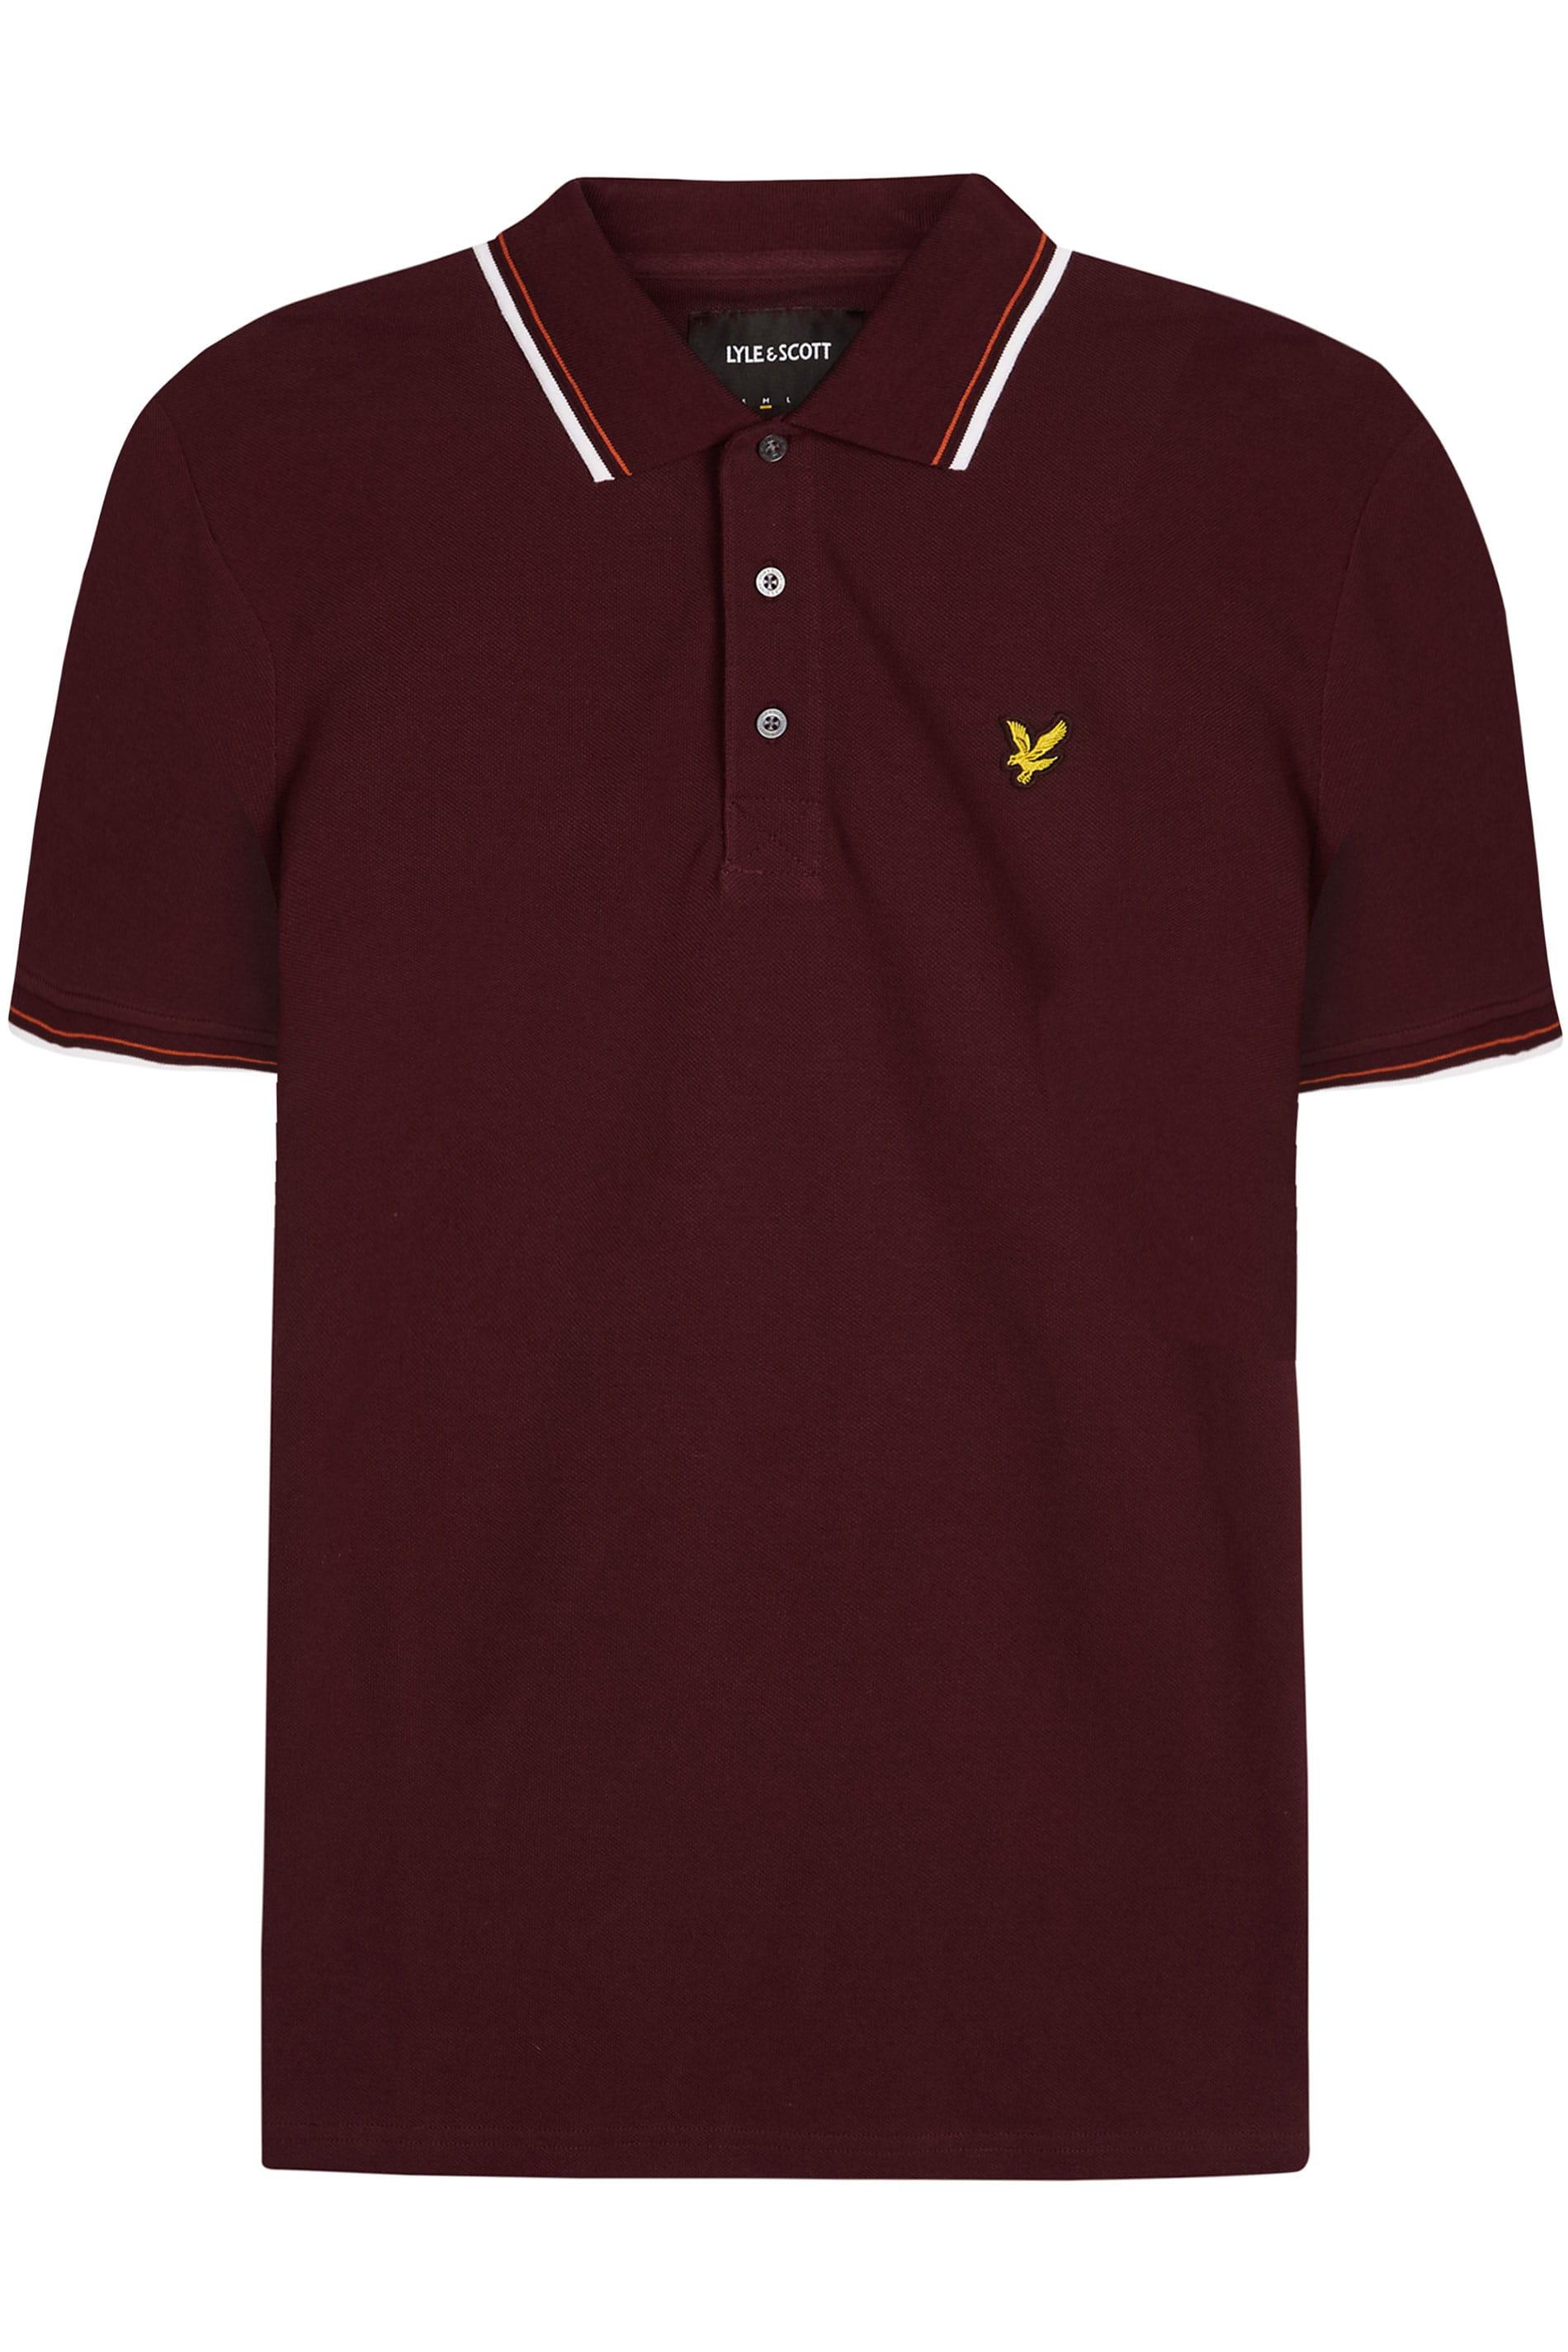 LYLE & SCOTT Burgundy Tipped Polo Shirt